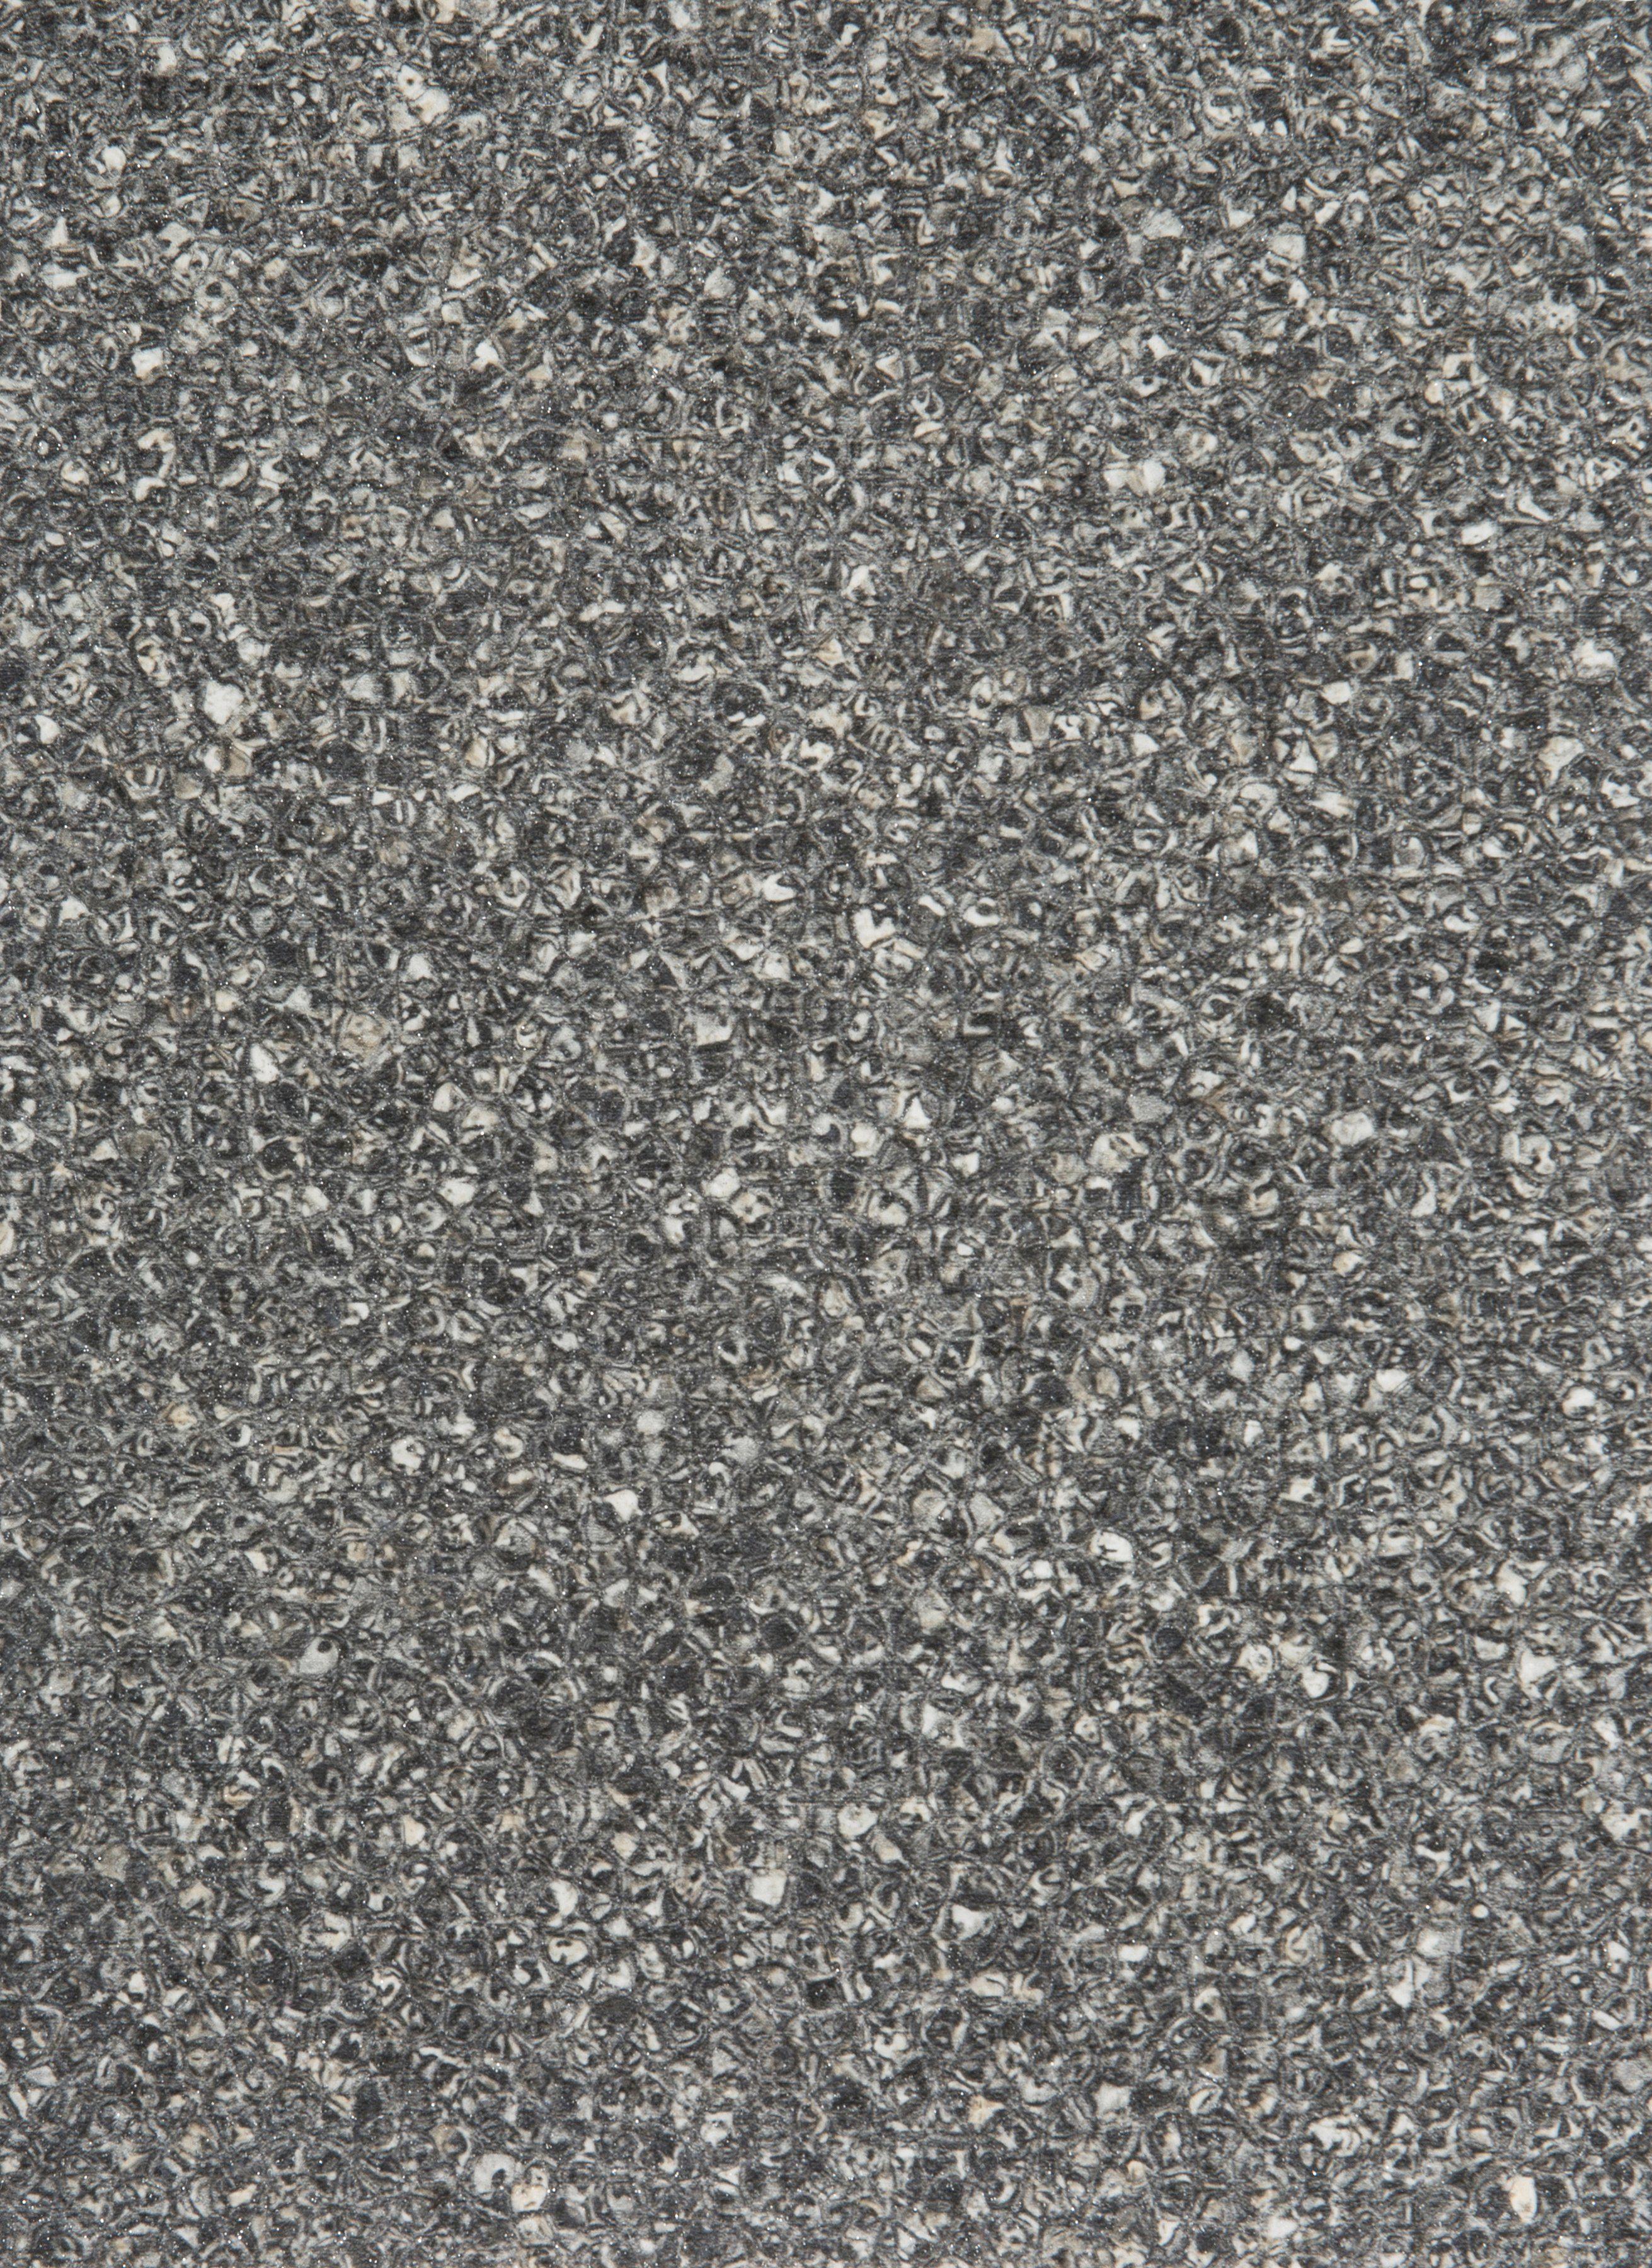 ANDIAMO Vinyl-Boden »Glare«, Breite 200 cm, grau